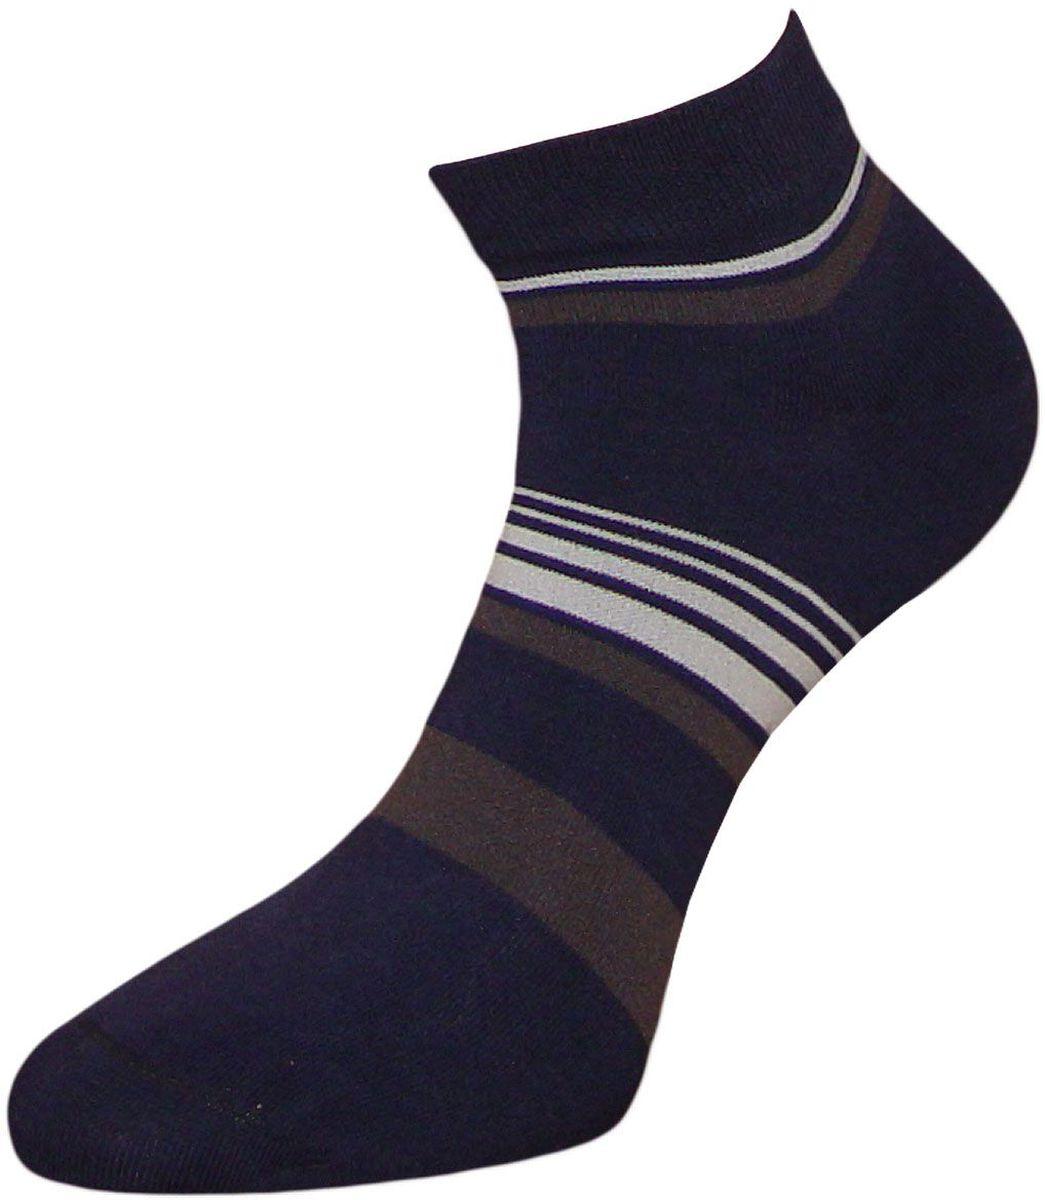 Носки мужские Гранд, цвет: темно-синий, 2 пары. ZCL84. Размер 25/27 носки гранд носки